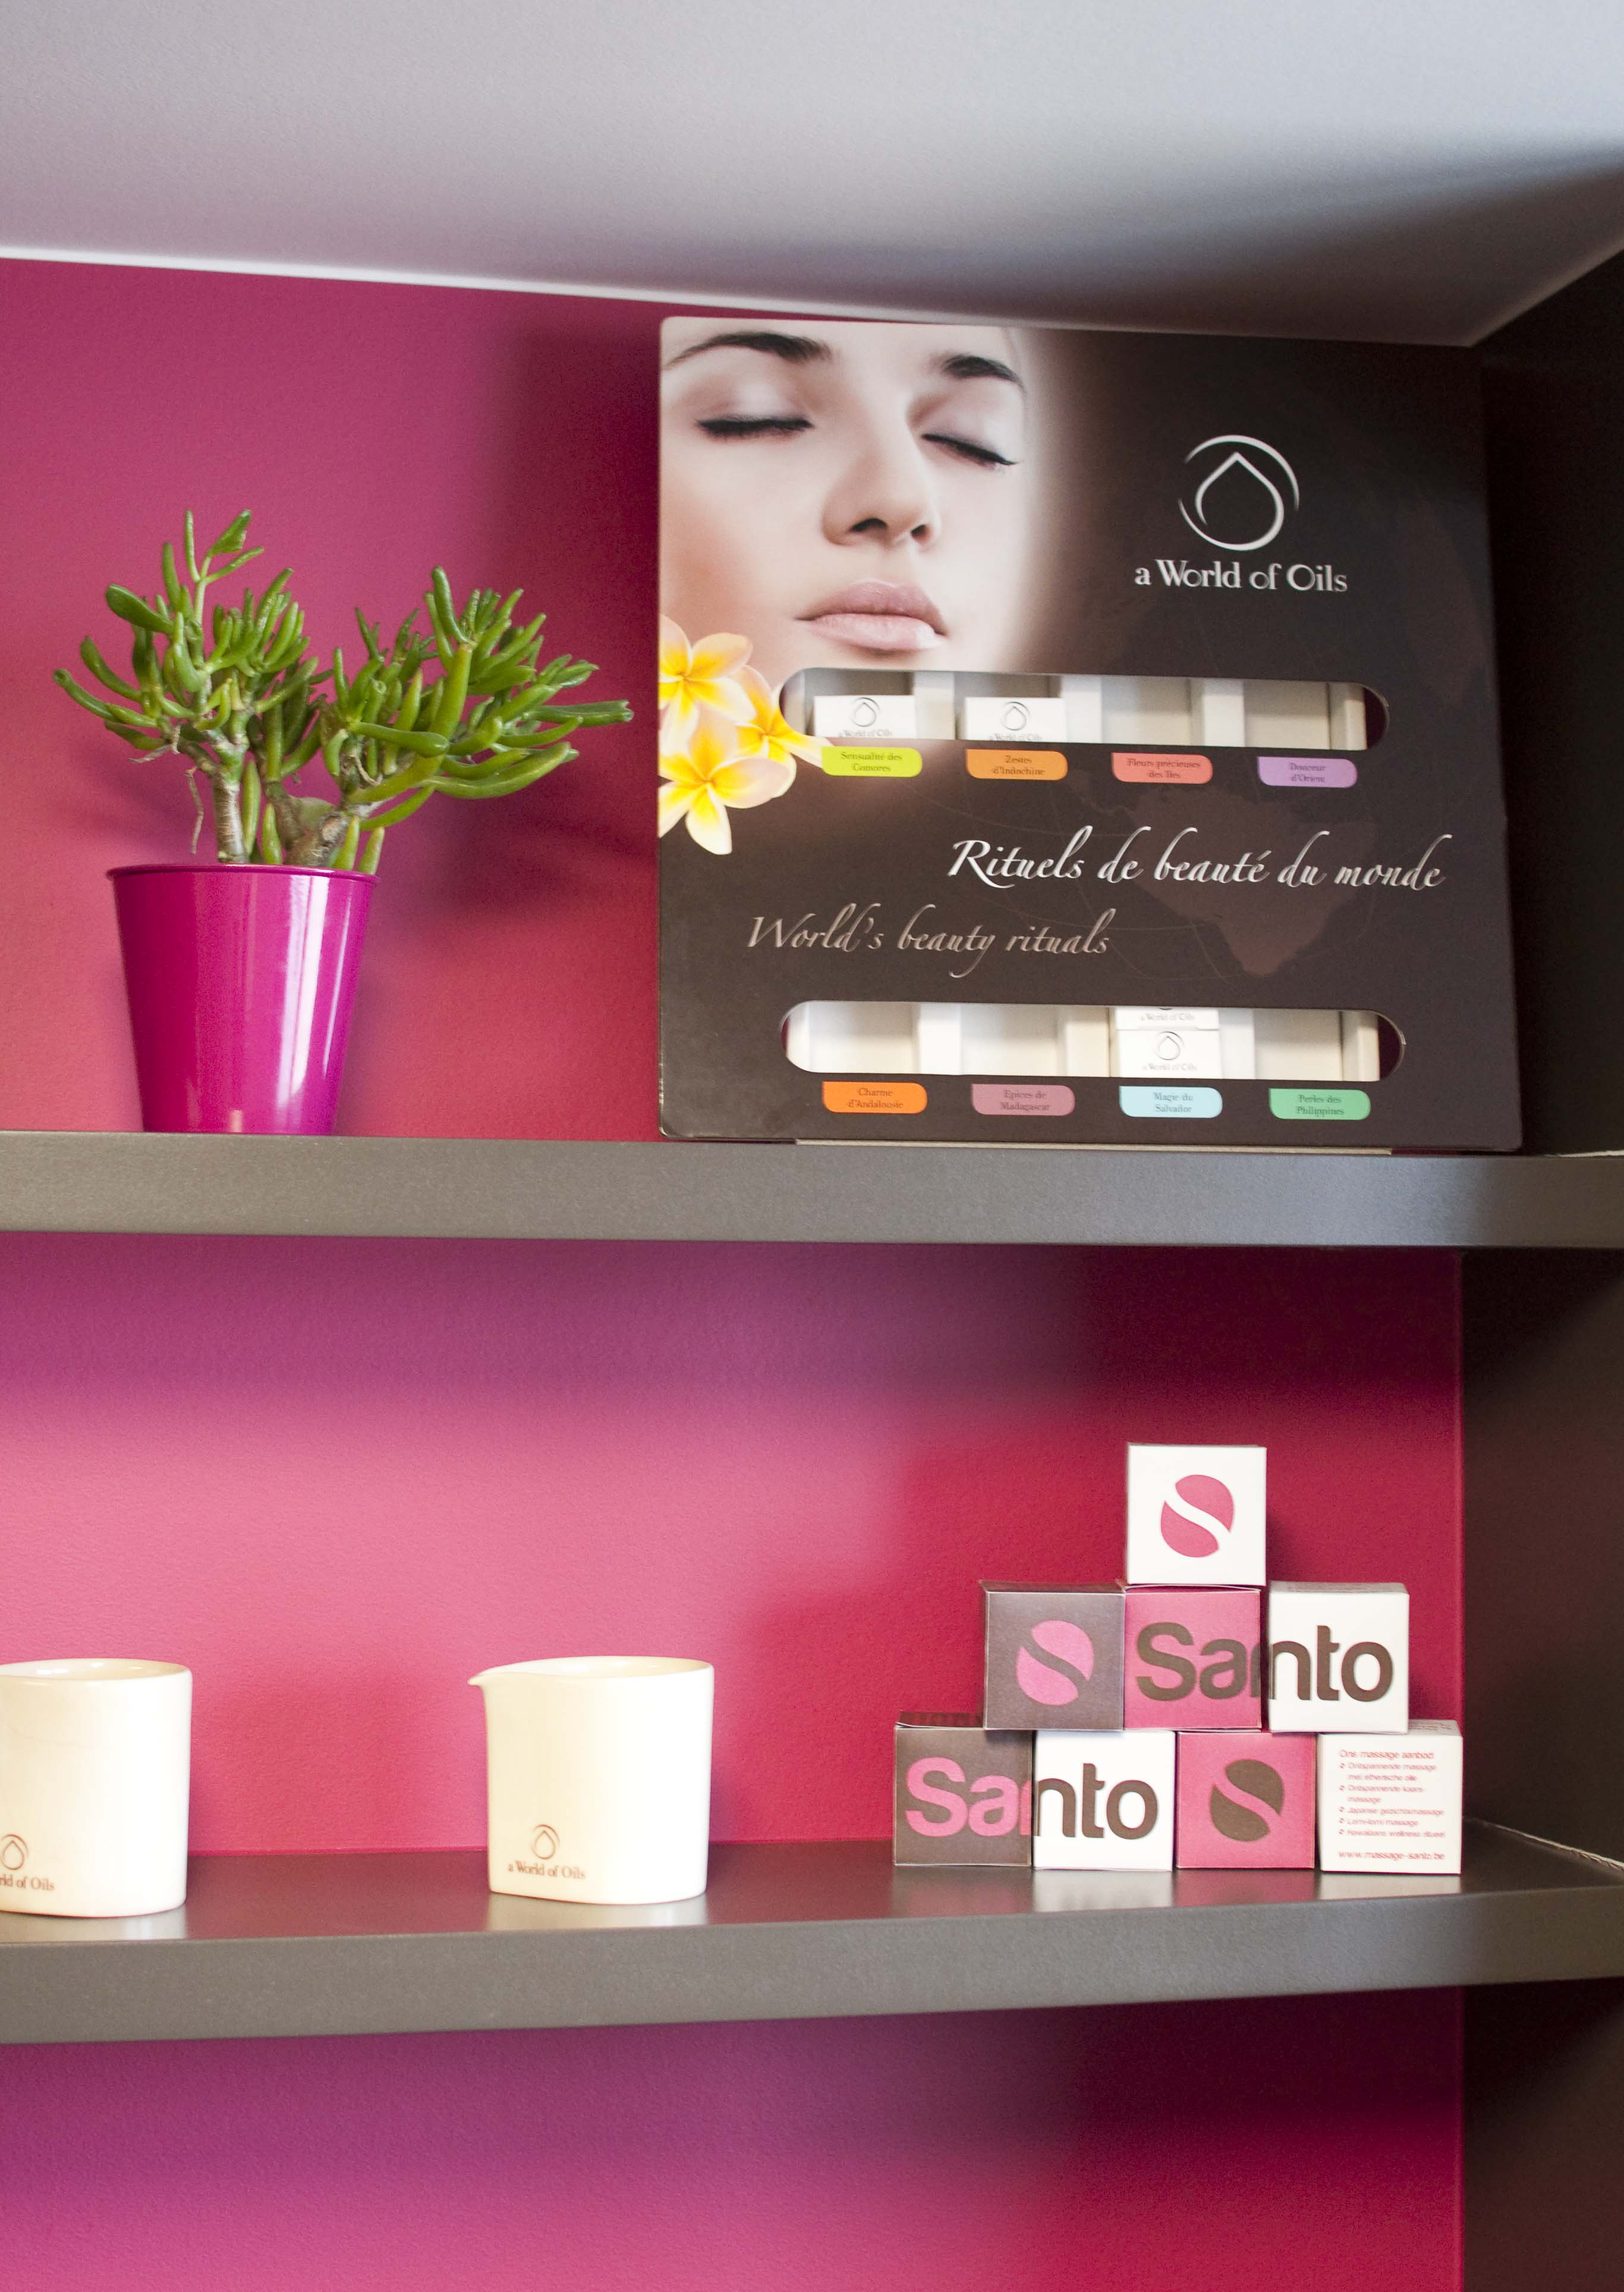 natuurlijke-massage-santo-belgie%cc%88_2